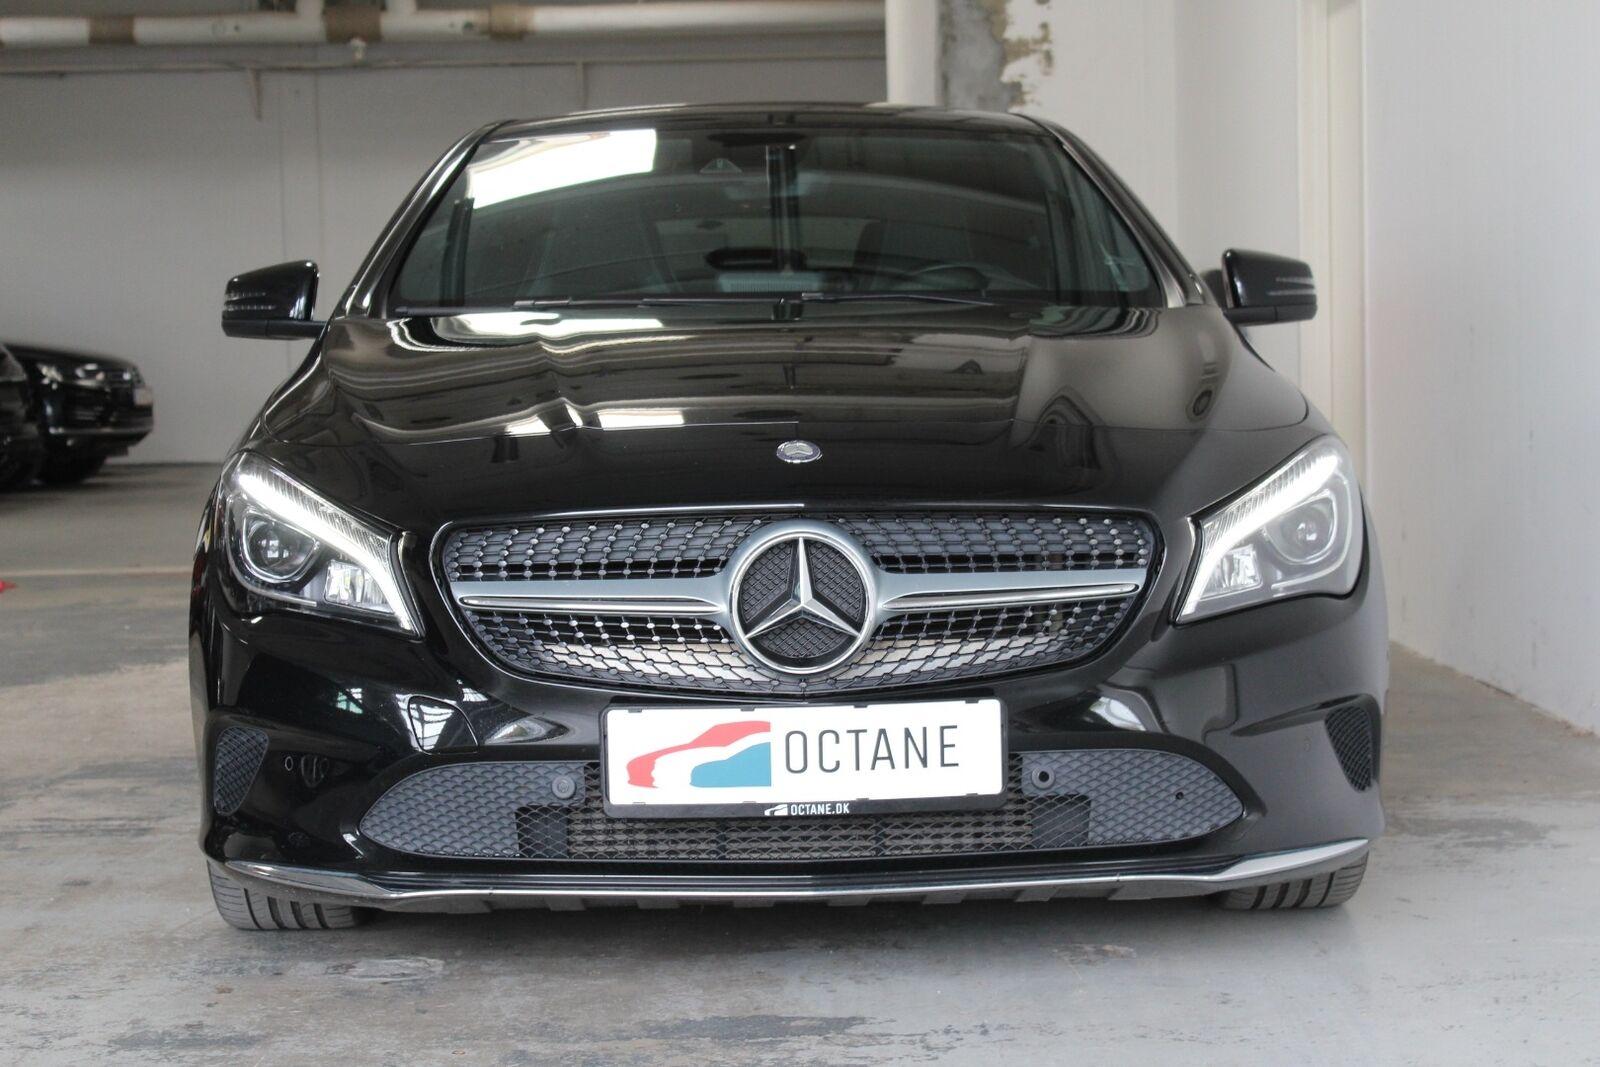 Mercedes CLA250 2,0 Shooting Brake aut. 5d - 334.900 kr.